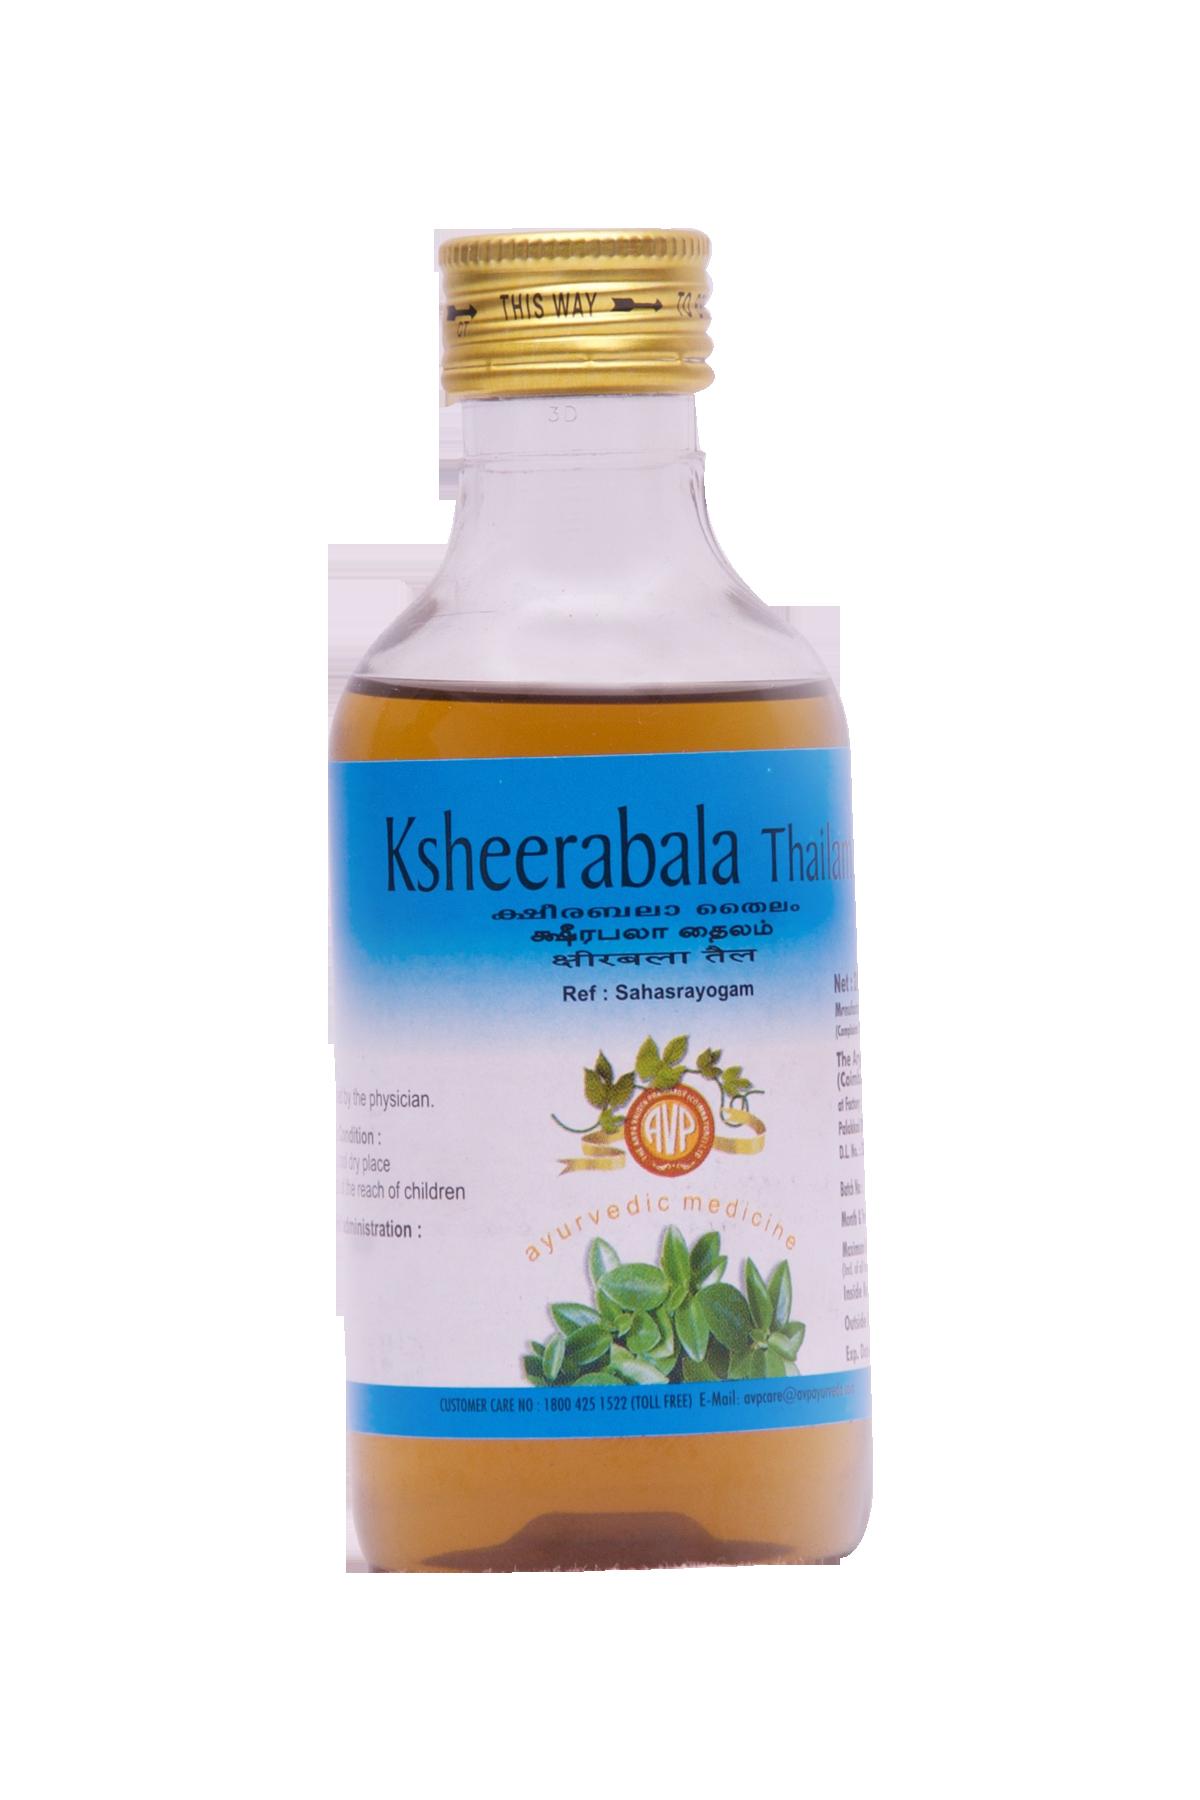 Arya Vaidya Pharmacy Ksheerabala Thailam